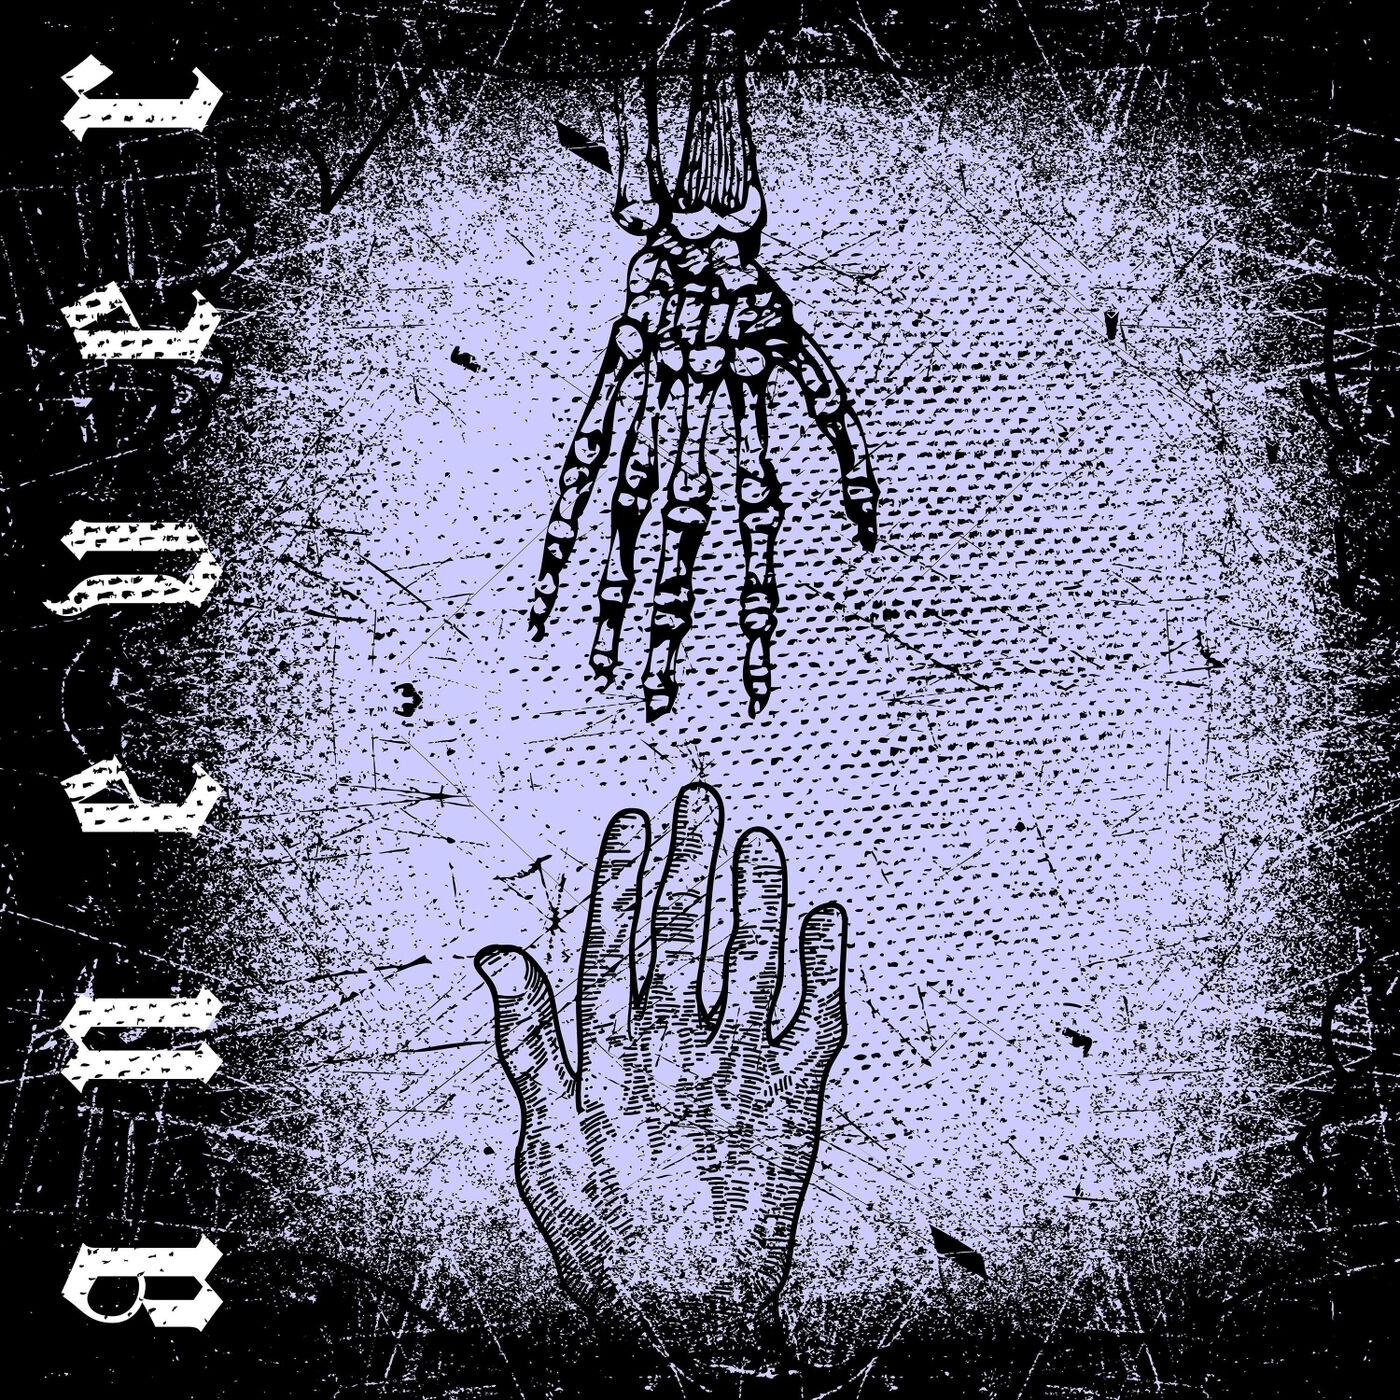 Anever - Hang Tight [single] (2020)